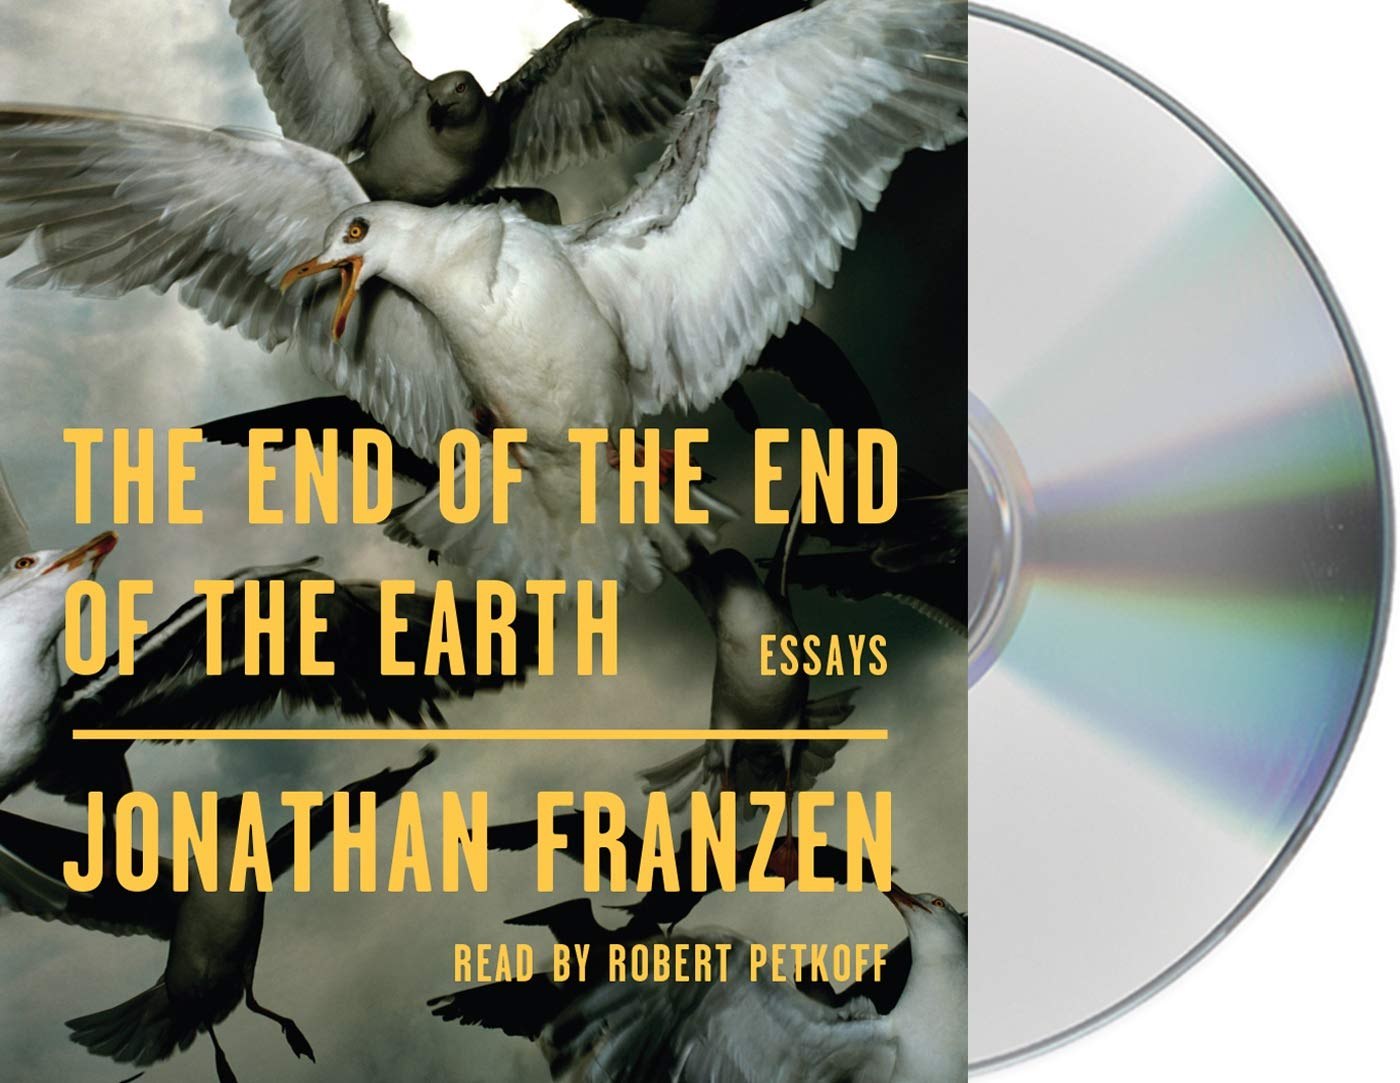 Earth end essay